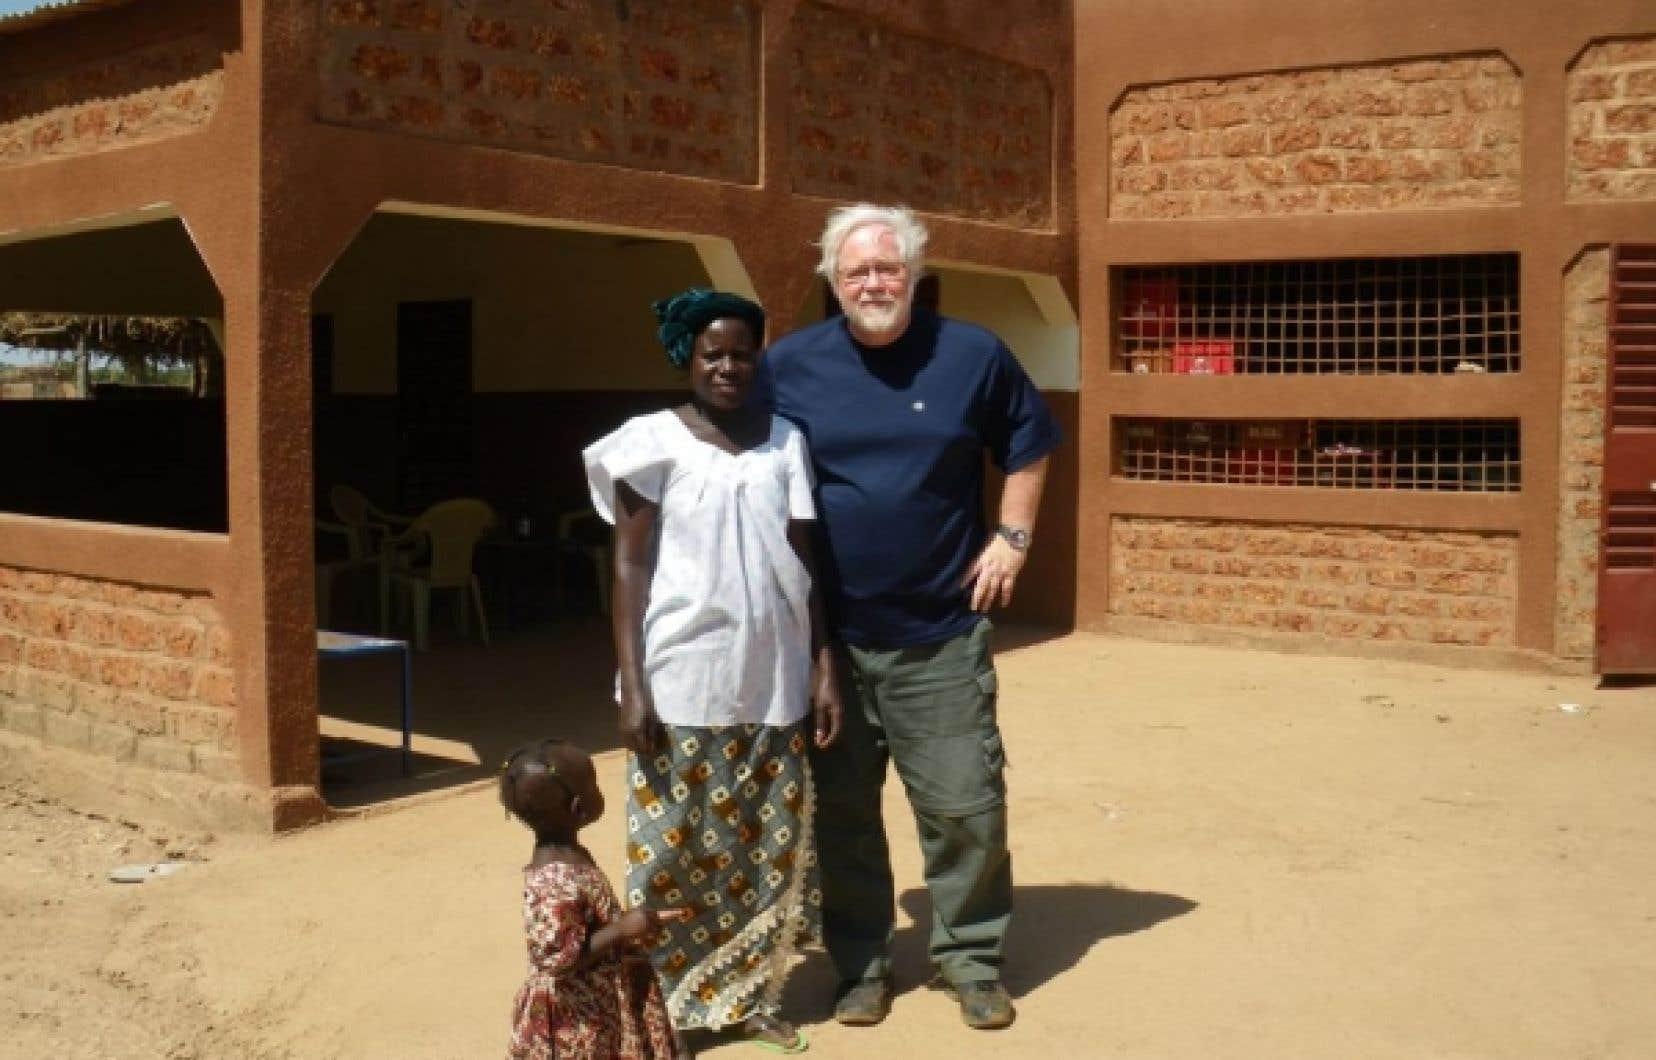 Réjean Tremblay en compagnie d'une Burkinabée.